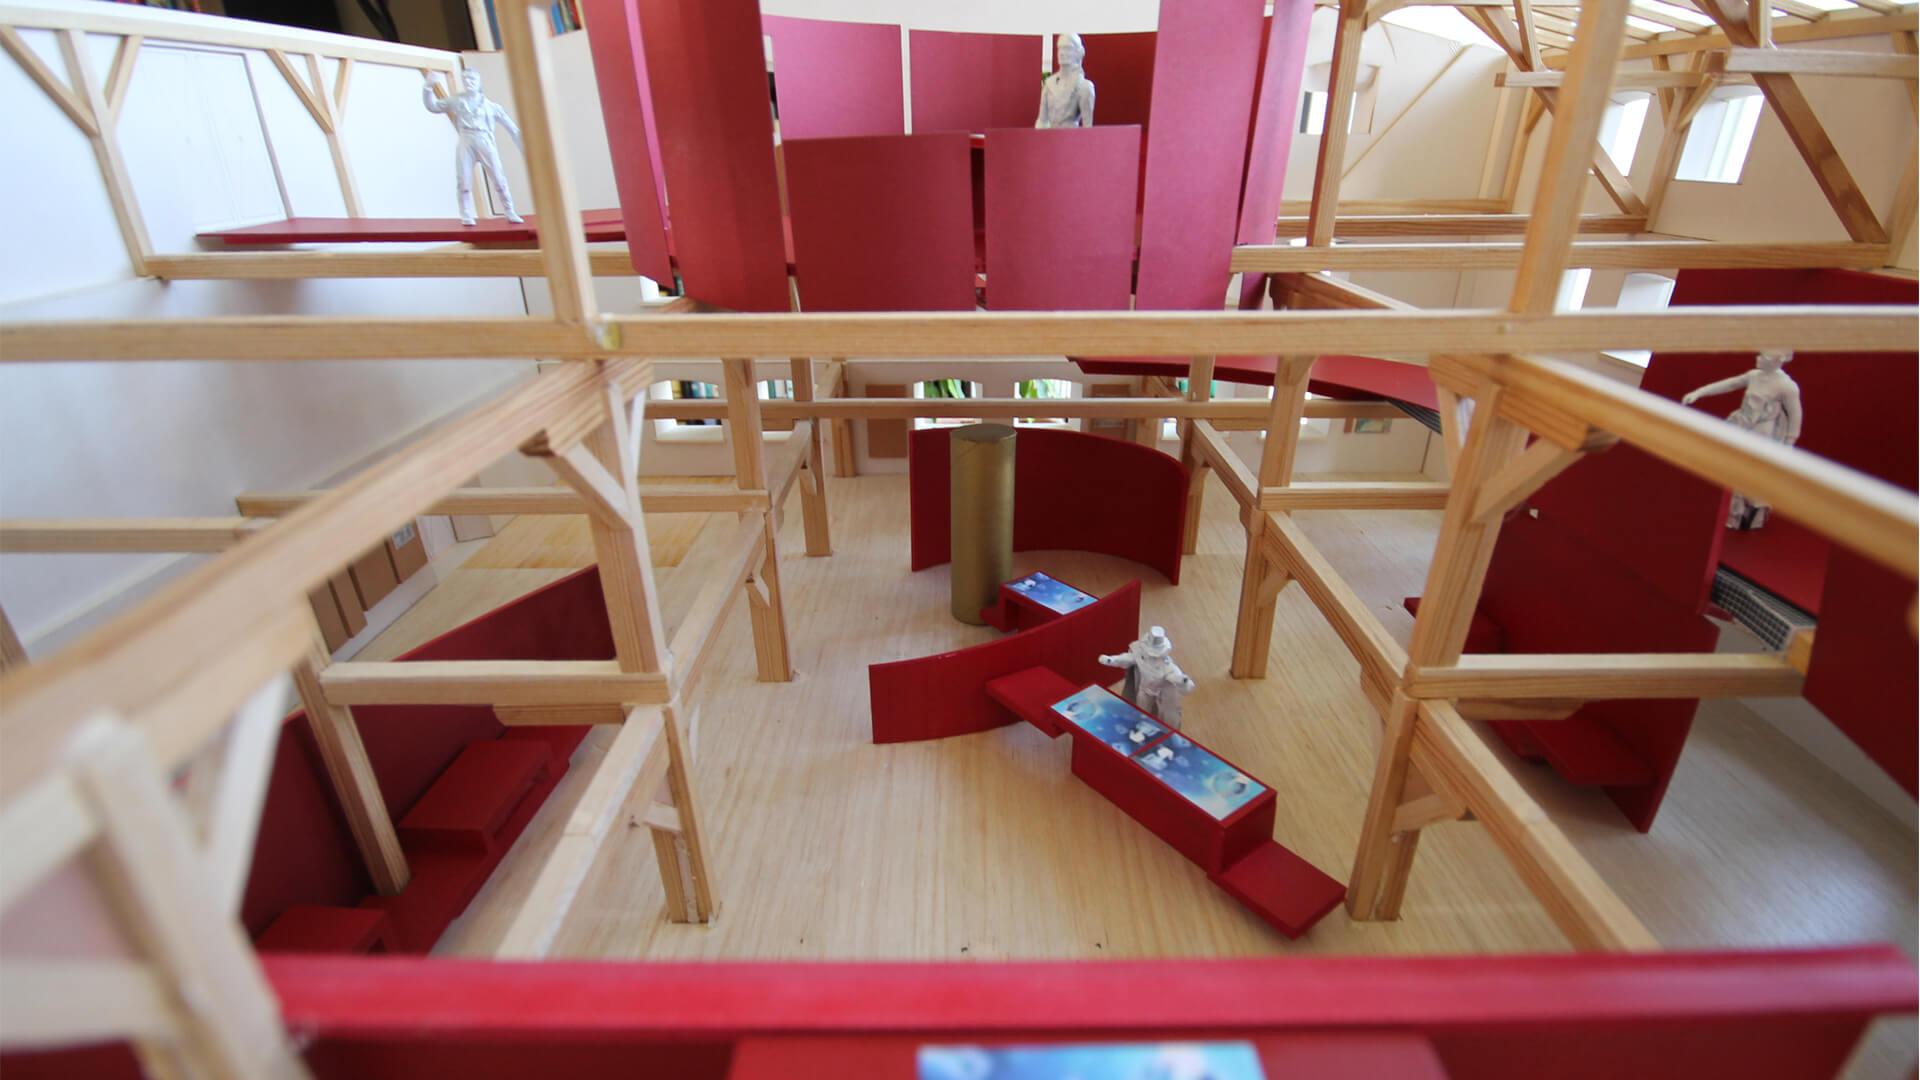 Stiegl-Brauwelt_museum-goes-interactive_02